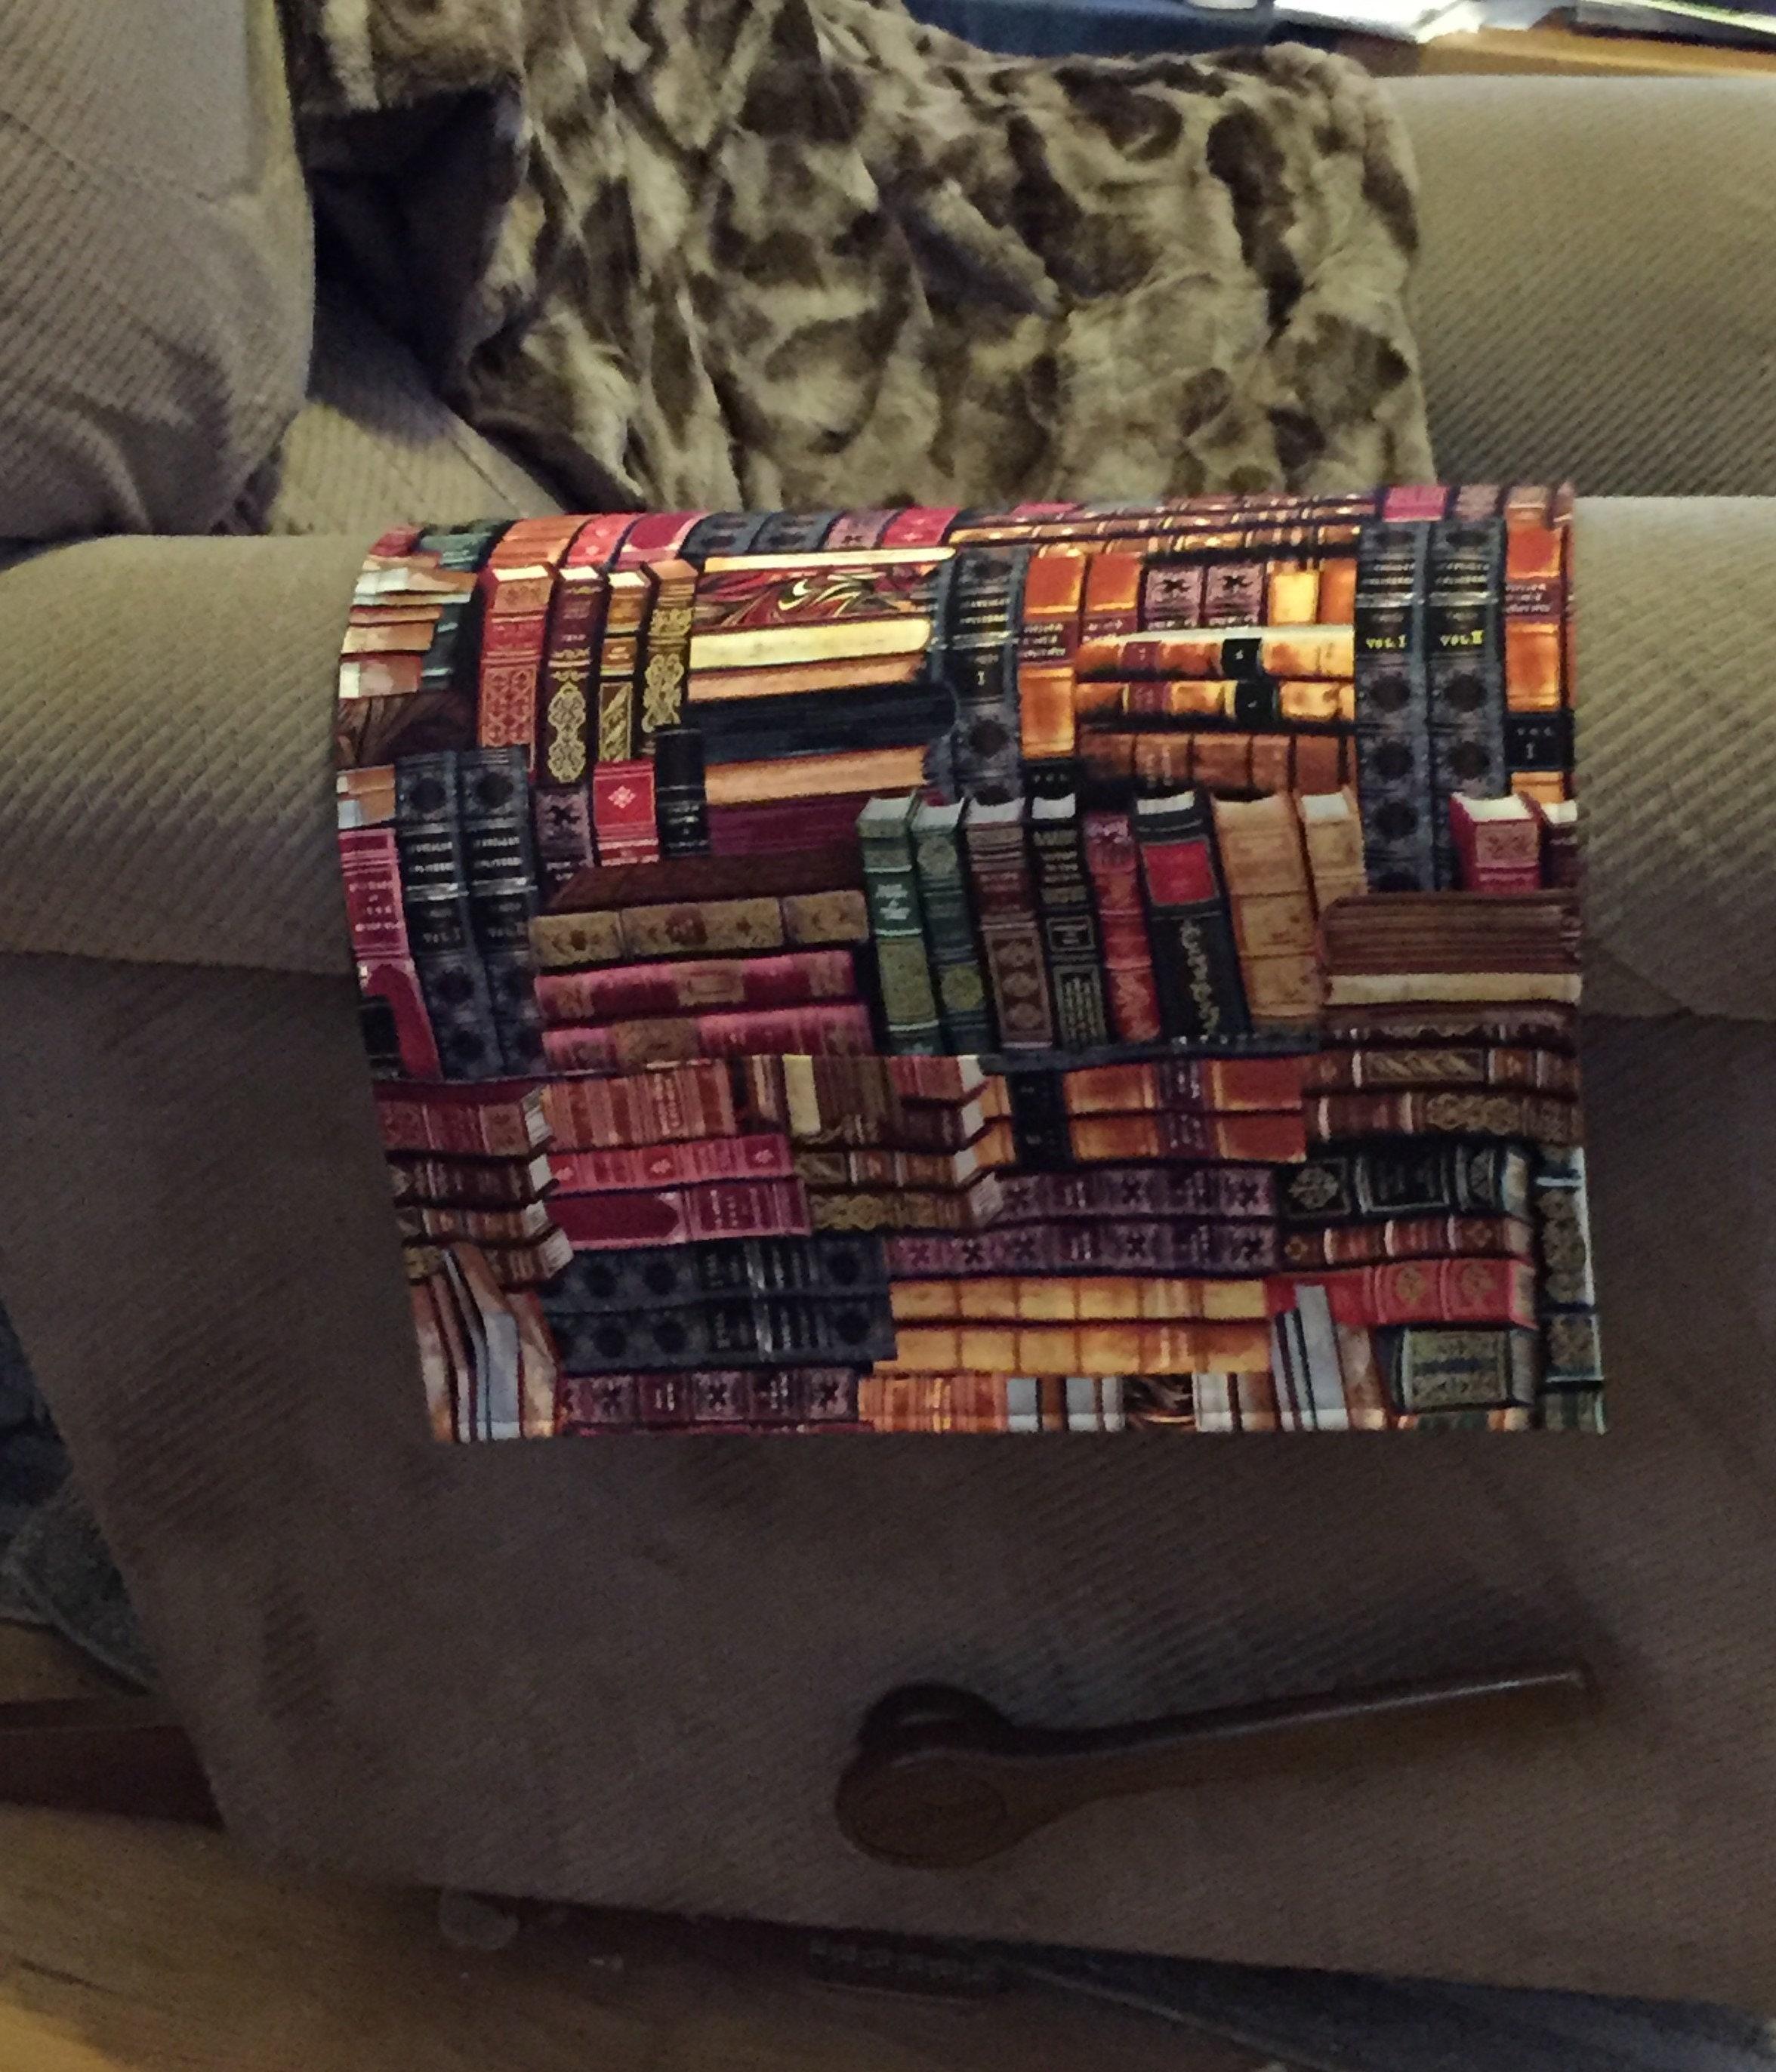 Remote Control Holder Nursing Home Gift Grandparent Gift Dad Gift Chair Caddy Arm Chair Organizer Recliner Pockets Stocking Stuffer